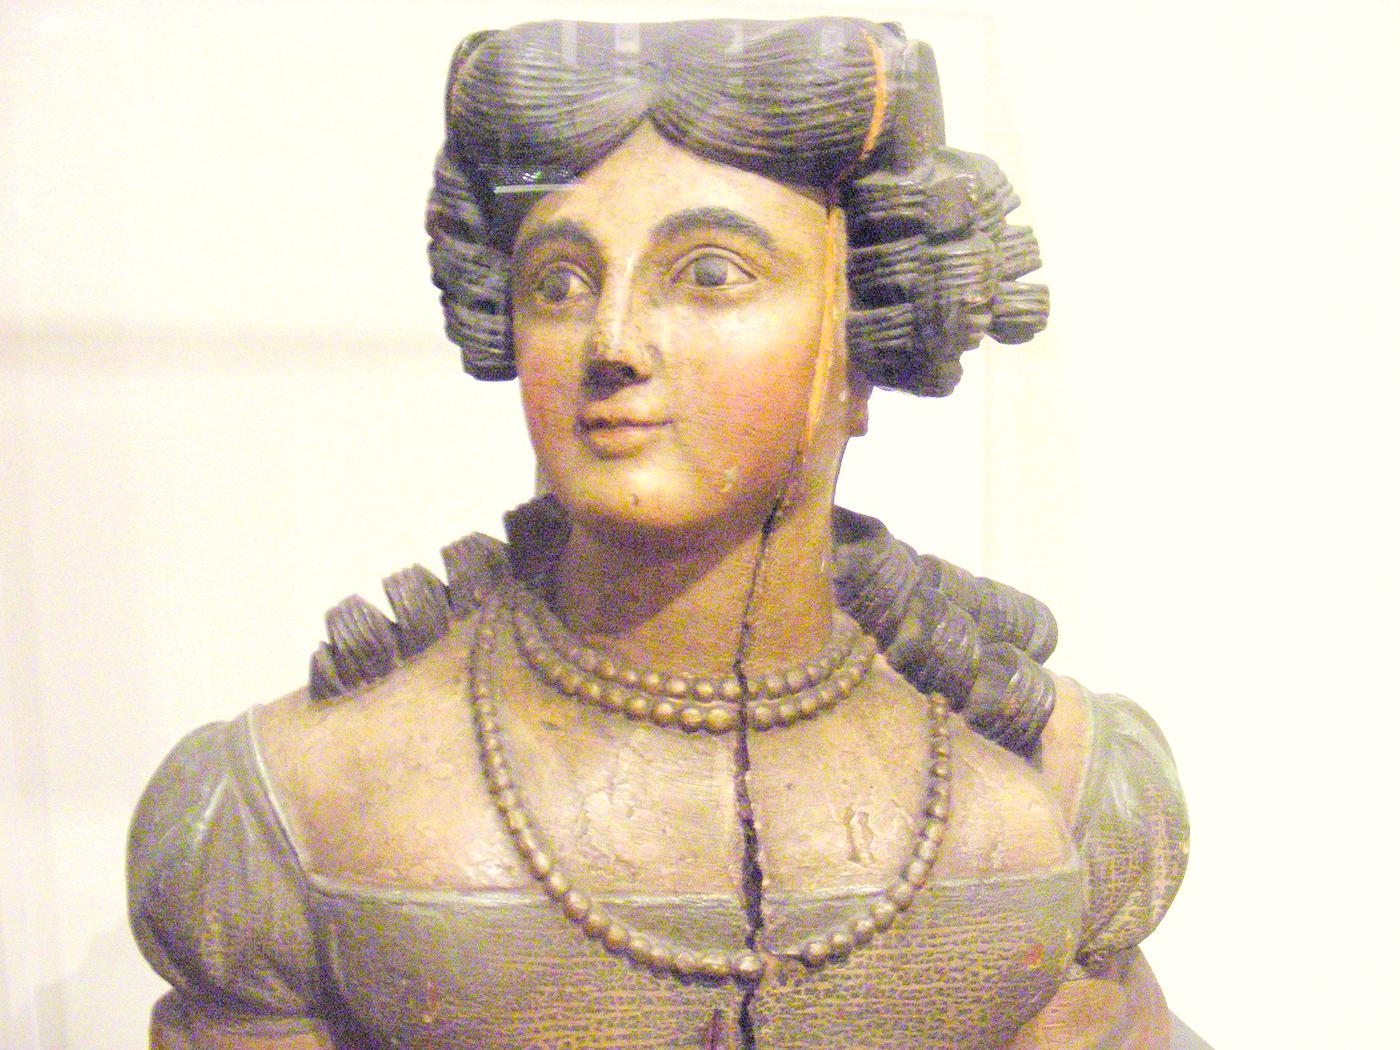 Peabody Essex Museum Victorian figure head